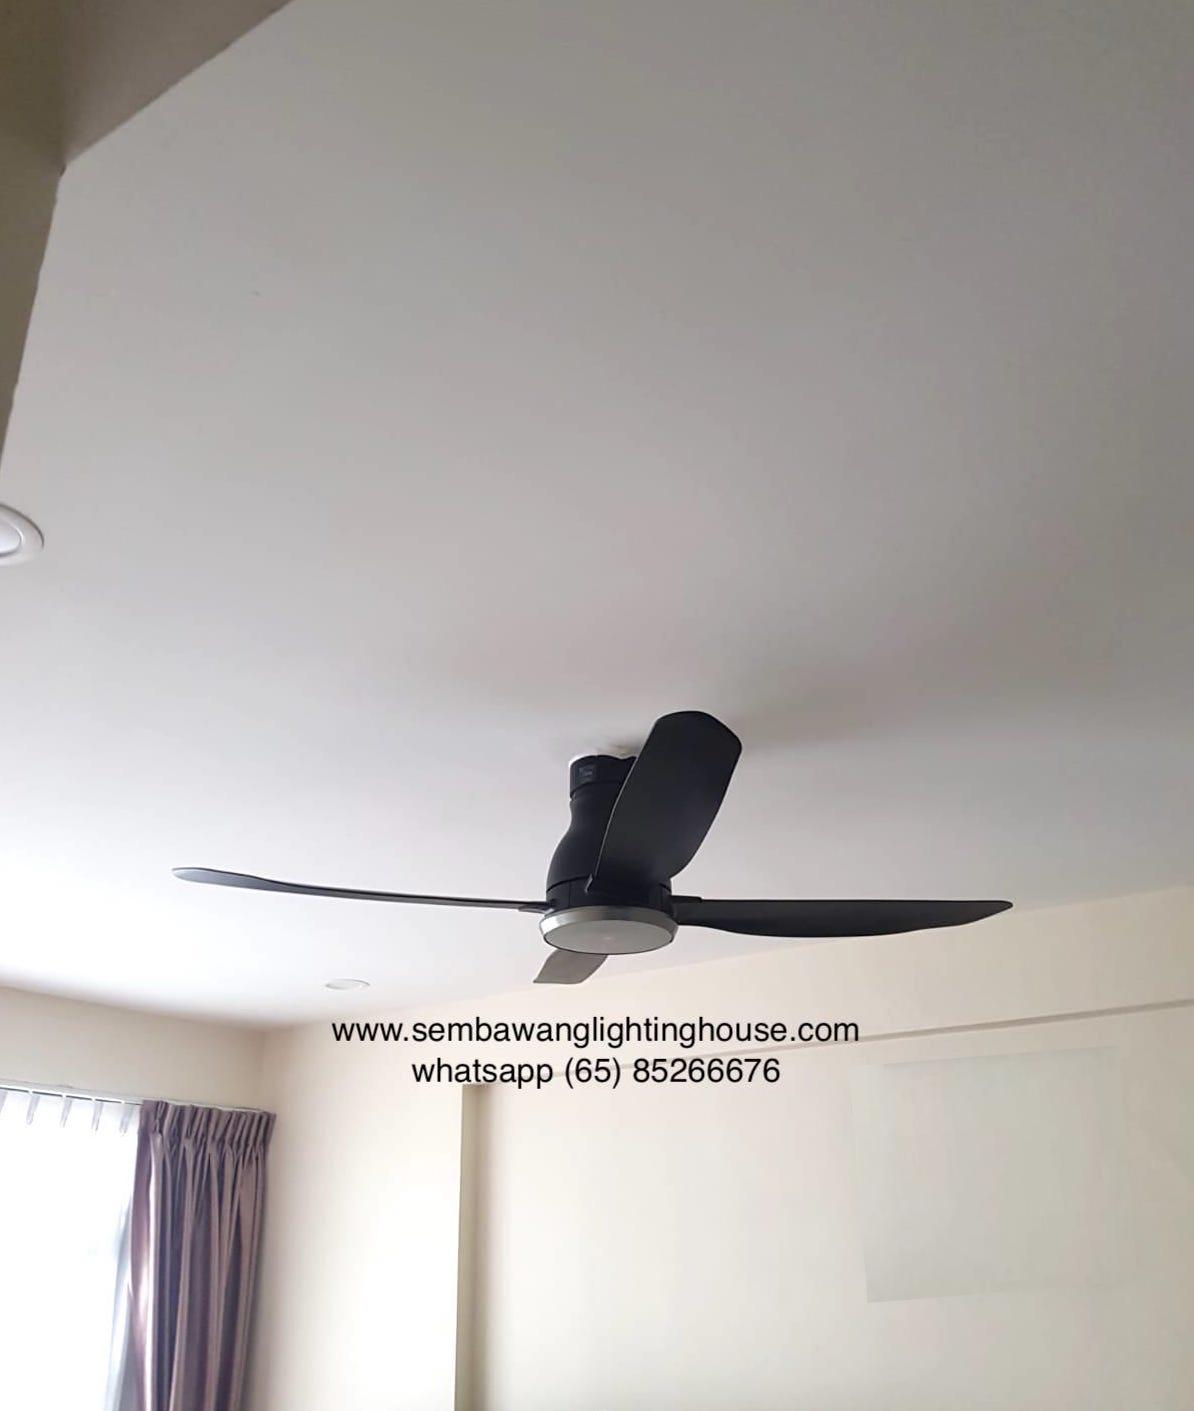 kdk-w56wv-black-ceiling-fan-sembawang-lighting-house-sample-01.jpg